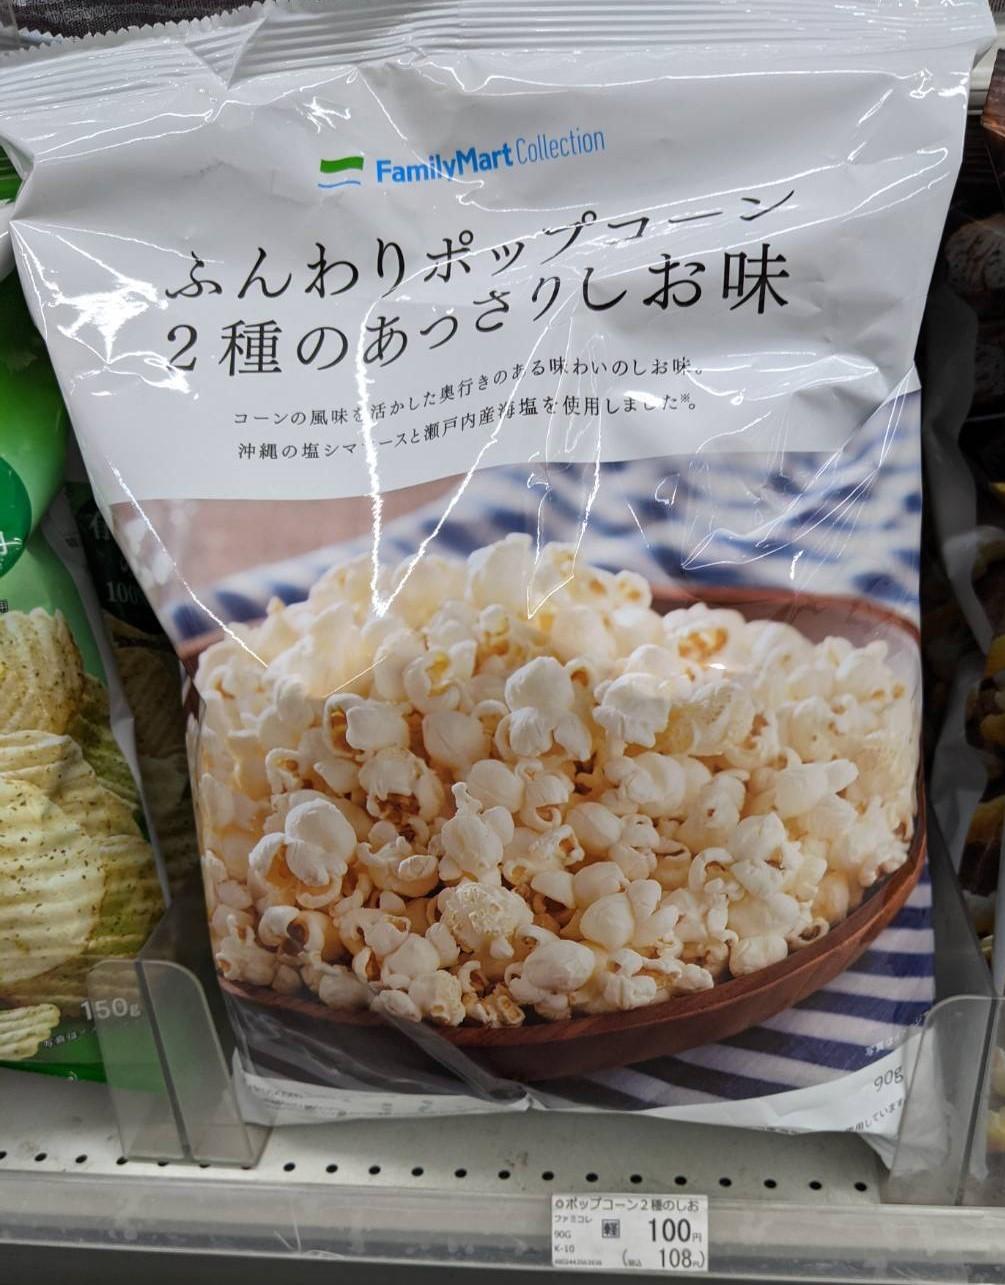 Family Mart Crispy Fluffy Popcorn with Two Kinds of Salt